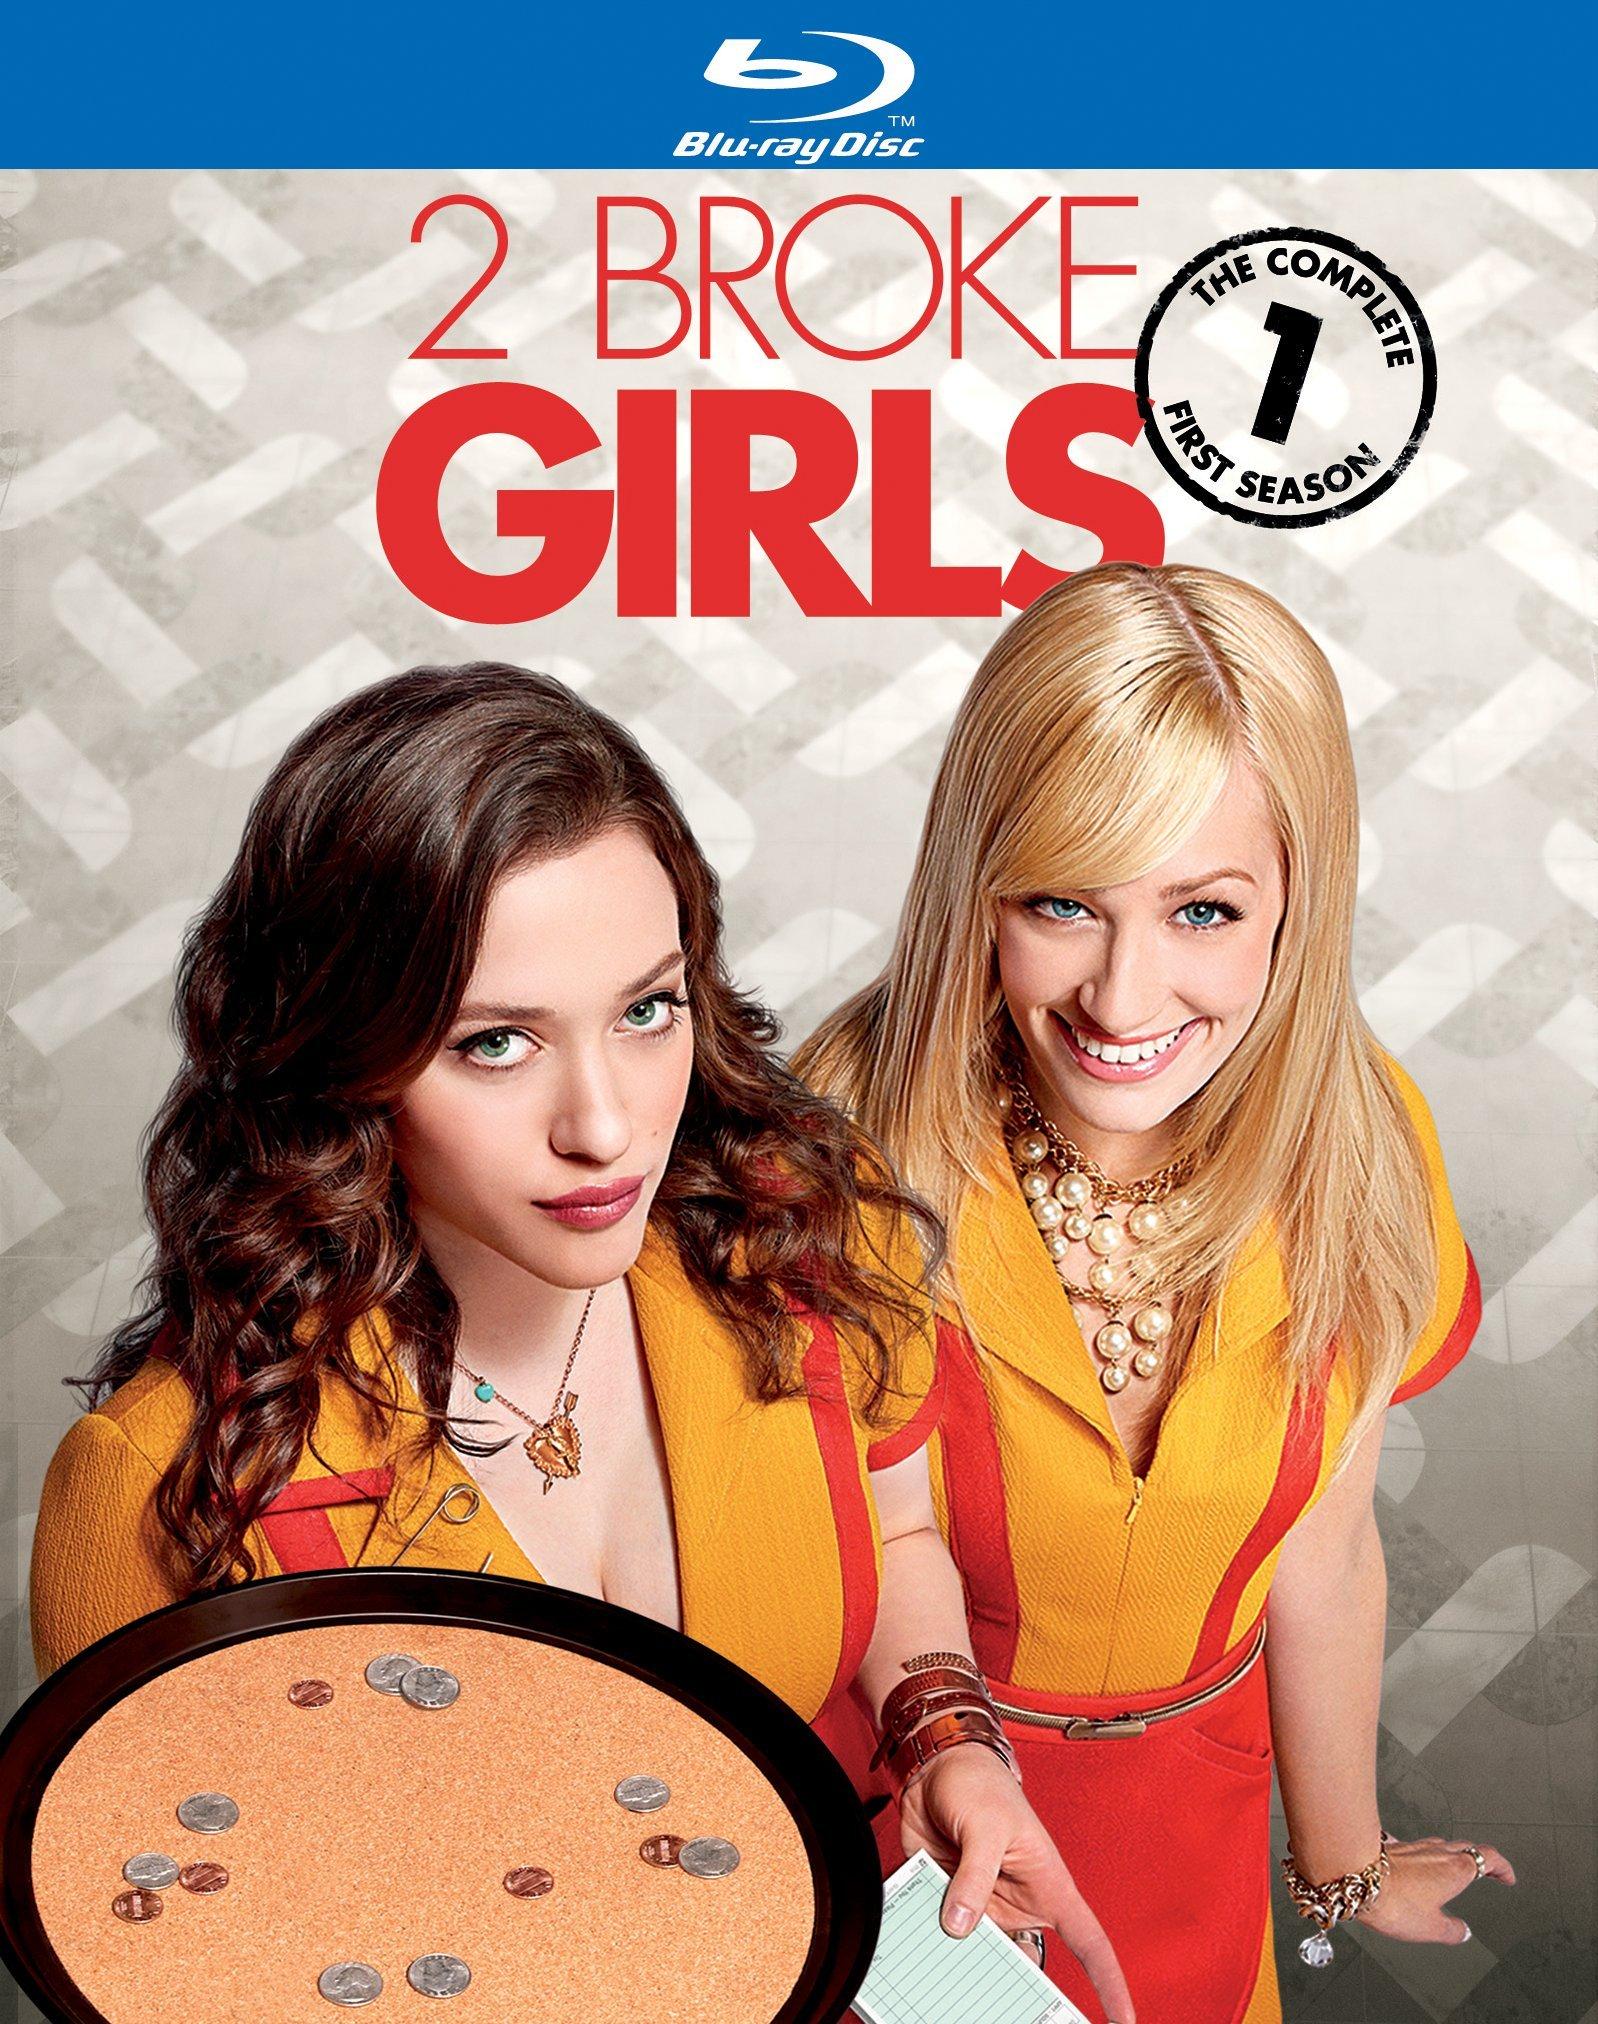 2 Broke Girls: 2 Girls Going for Broke (Video 2012) - IMDb